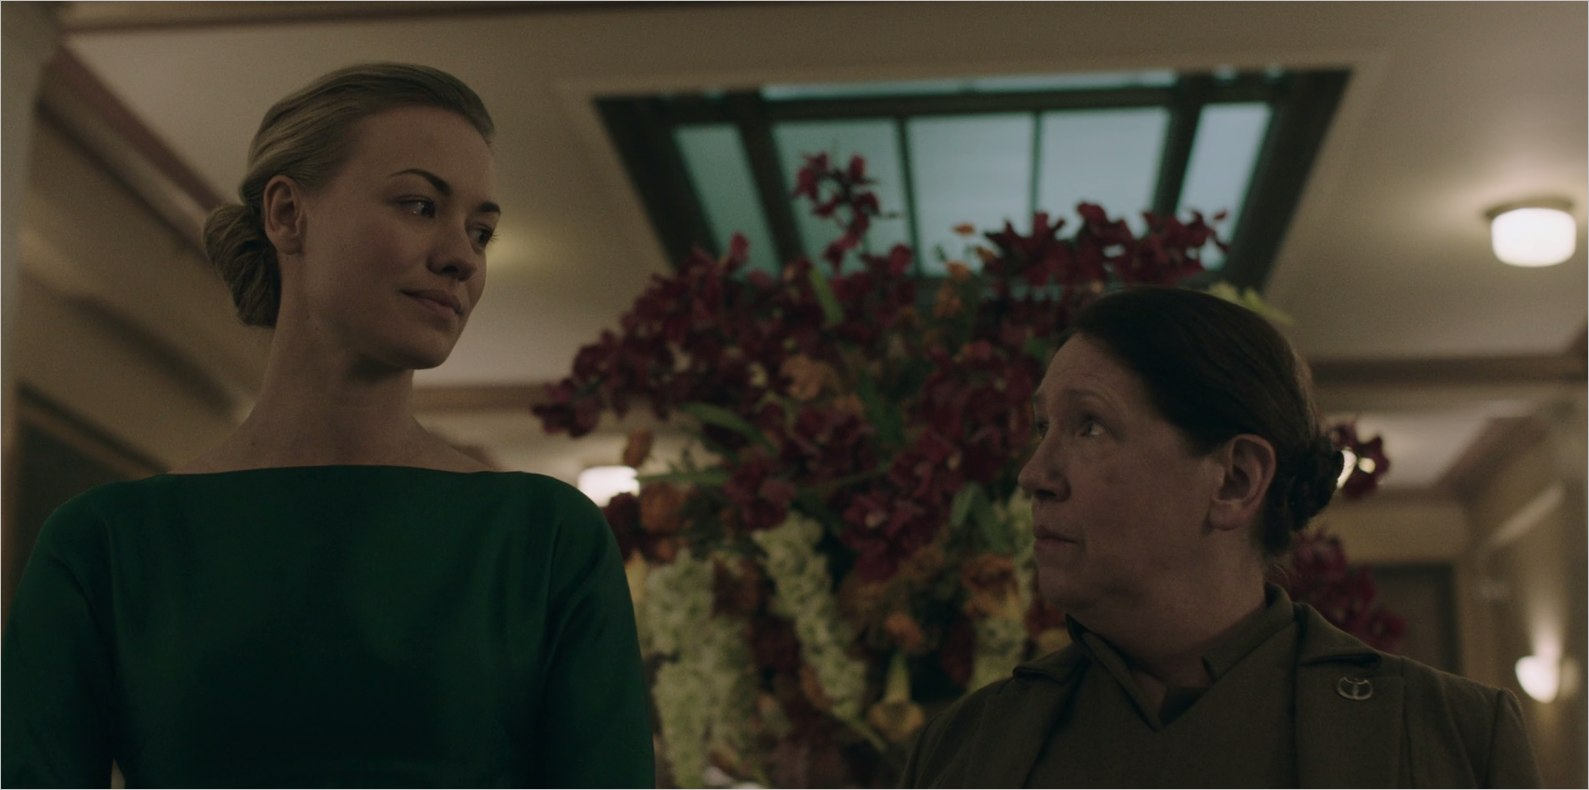 L'ordre de Serena Waterford à Tante Lydia - Episode 6